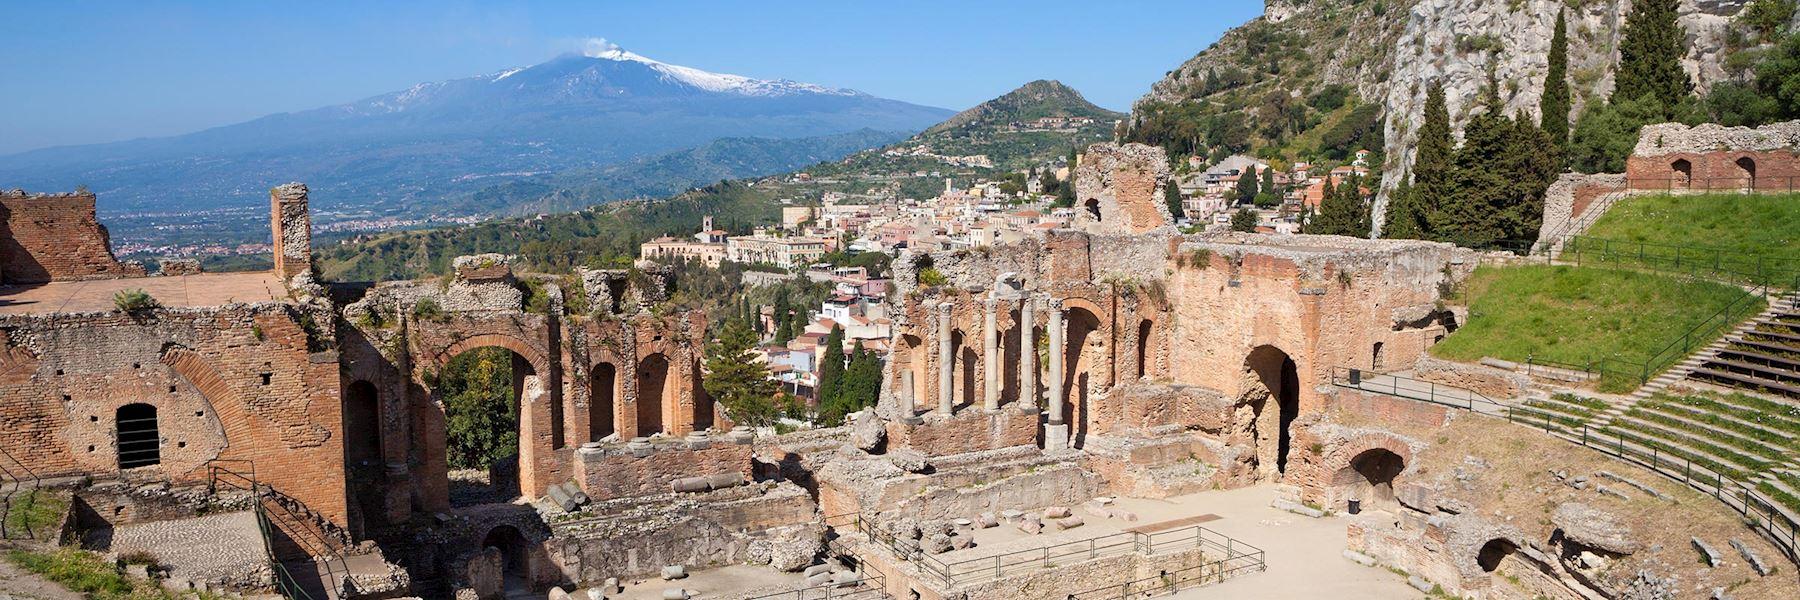 Visit Taormina, Italy